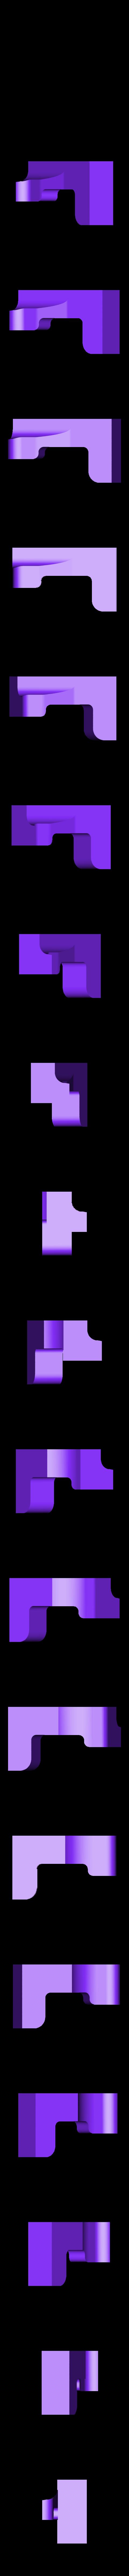 Front_Engine_-_Part_6-arm_1.STL Download free STL file 4-8-8-4 Big Boy Locomotive • 3D printer object, RaymondDeLuca